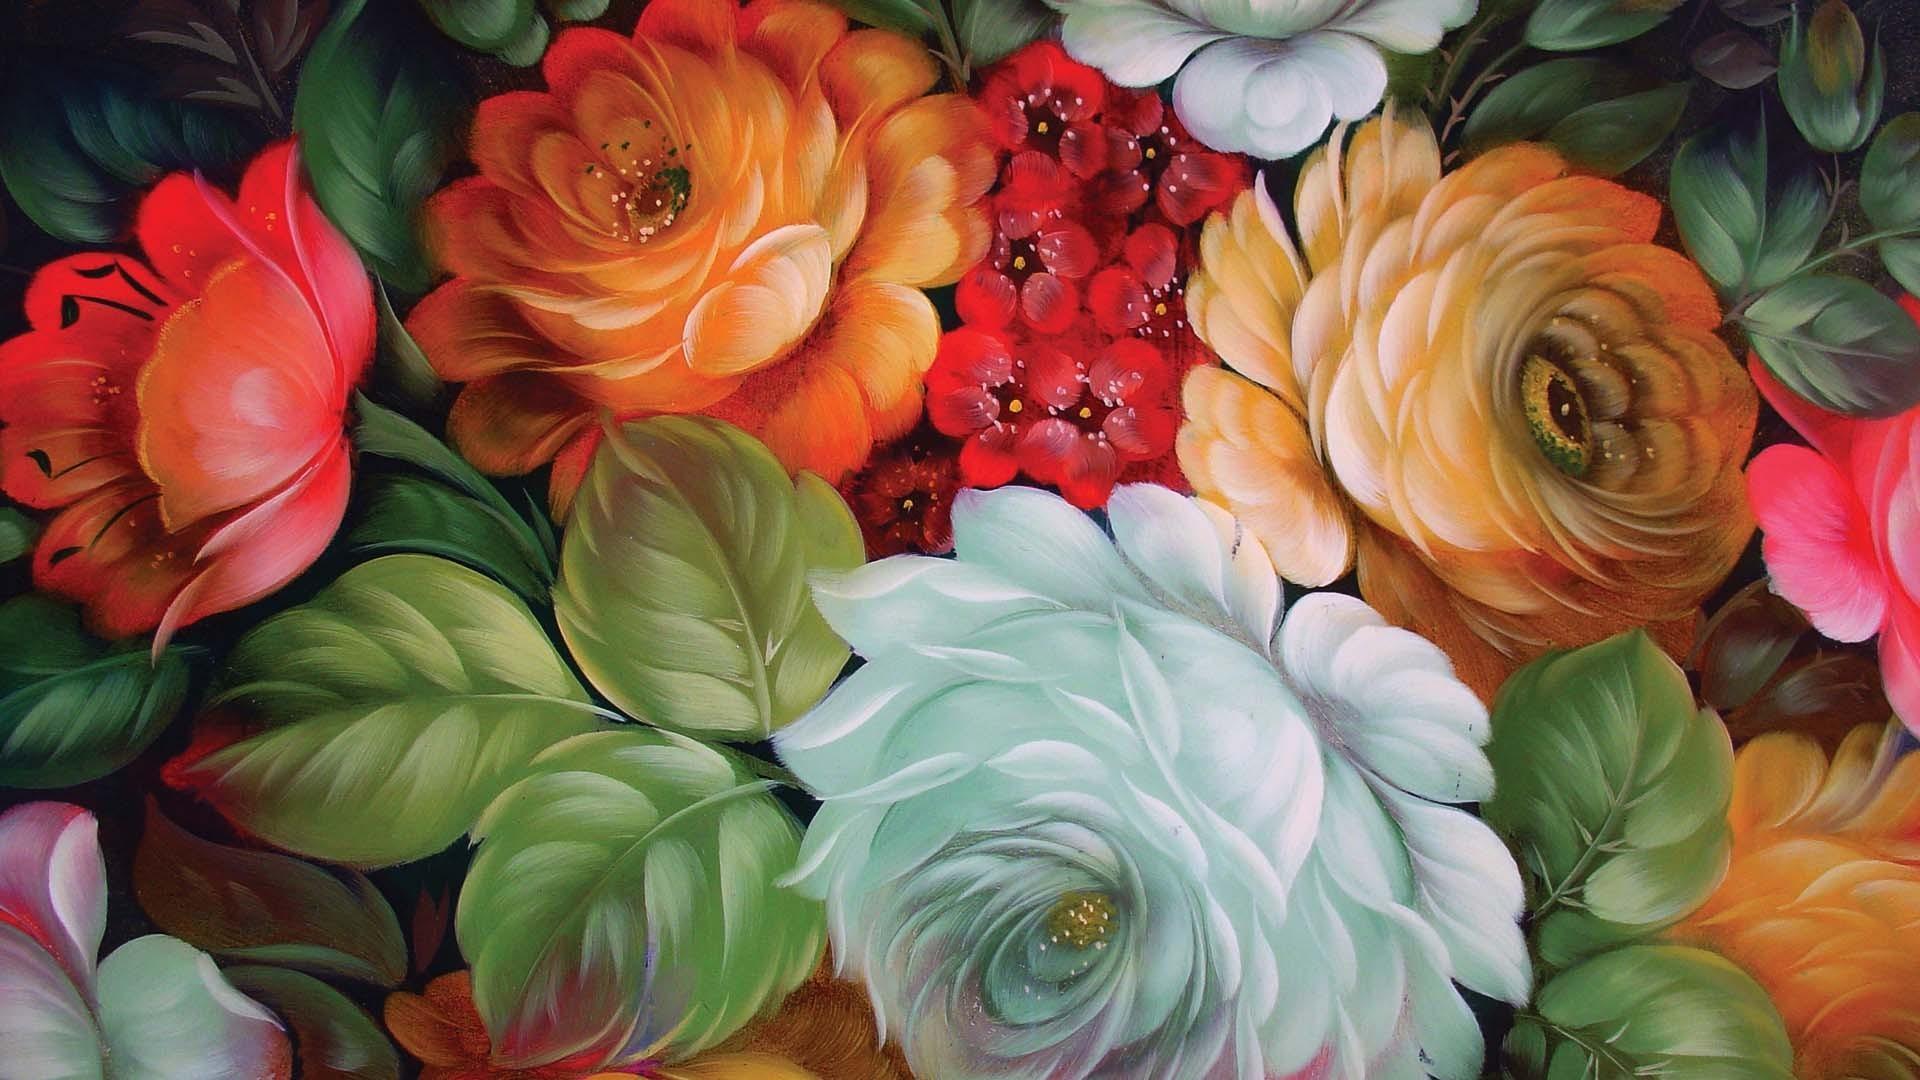 Art paintings flowers bouquet wallpaper 1920x1080 for Art flowers